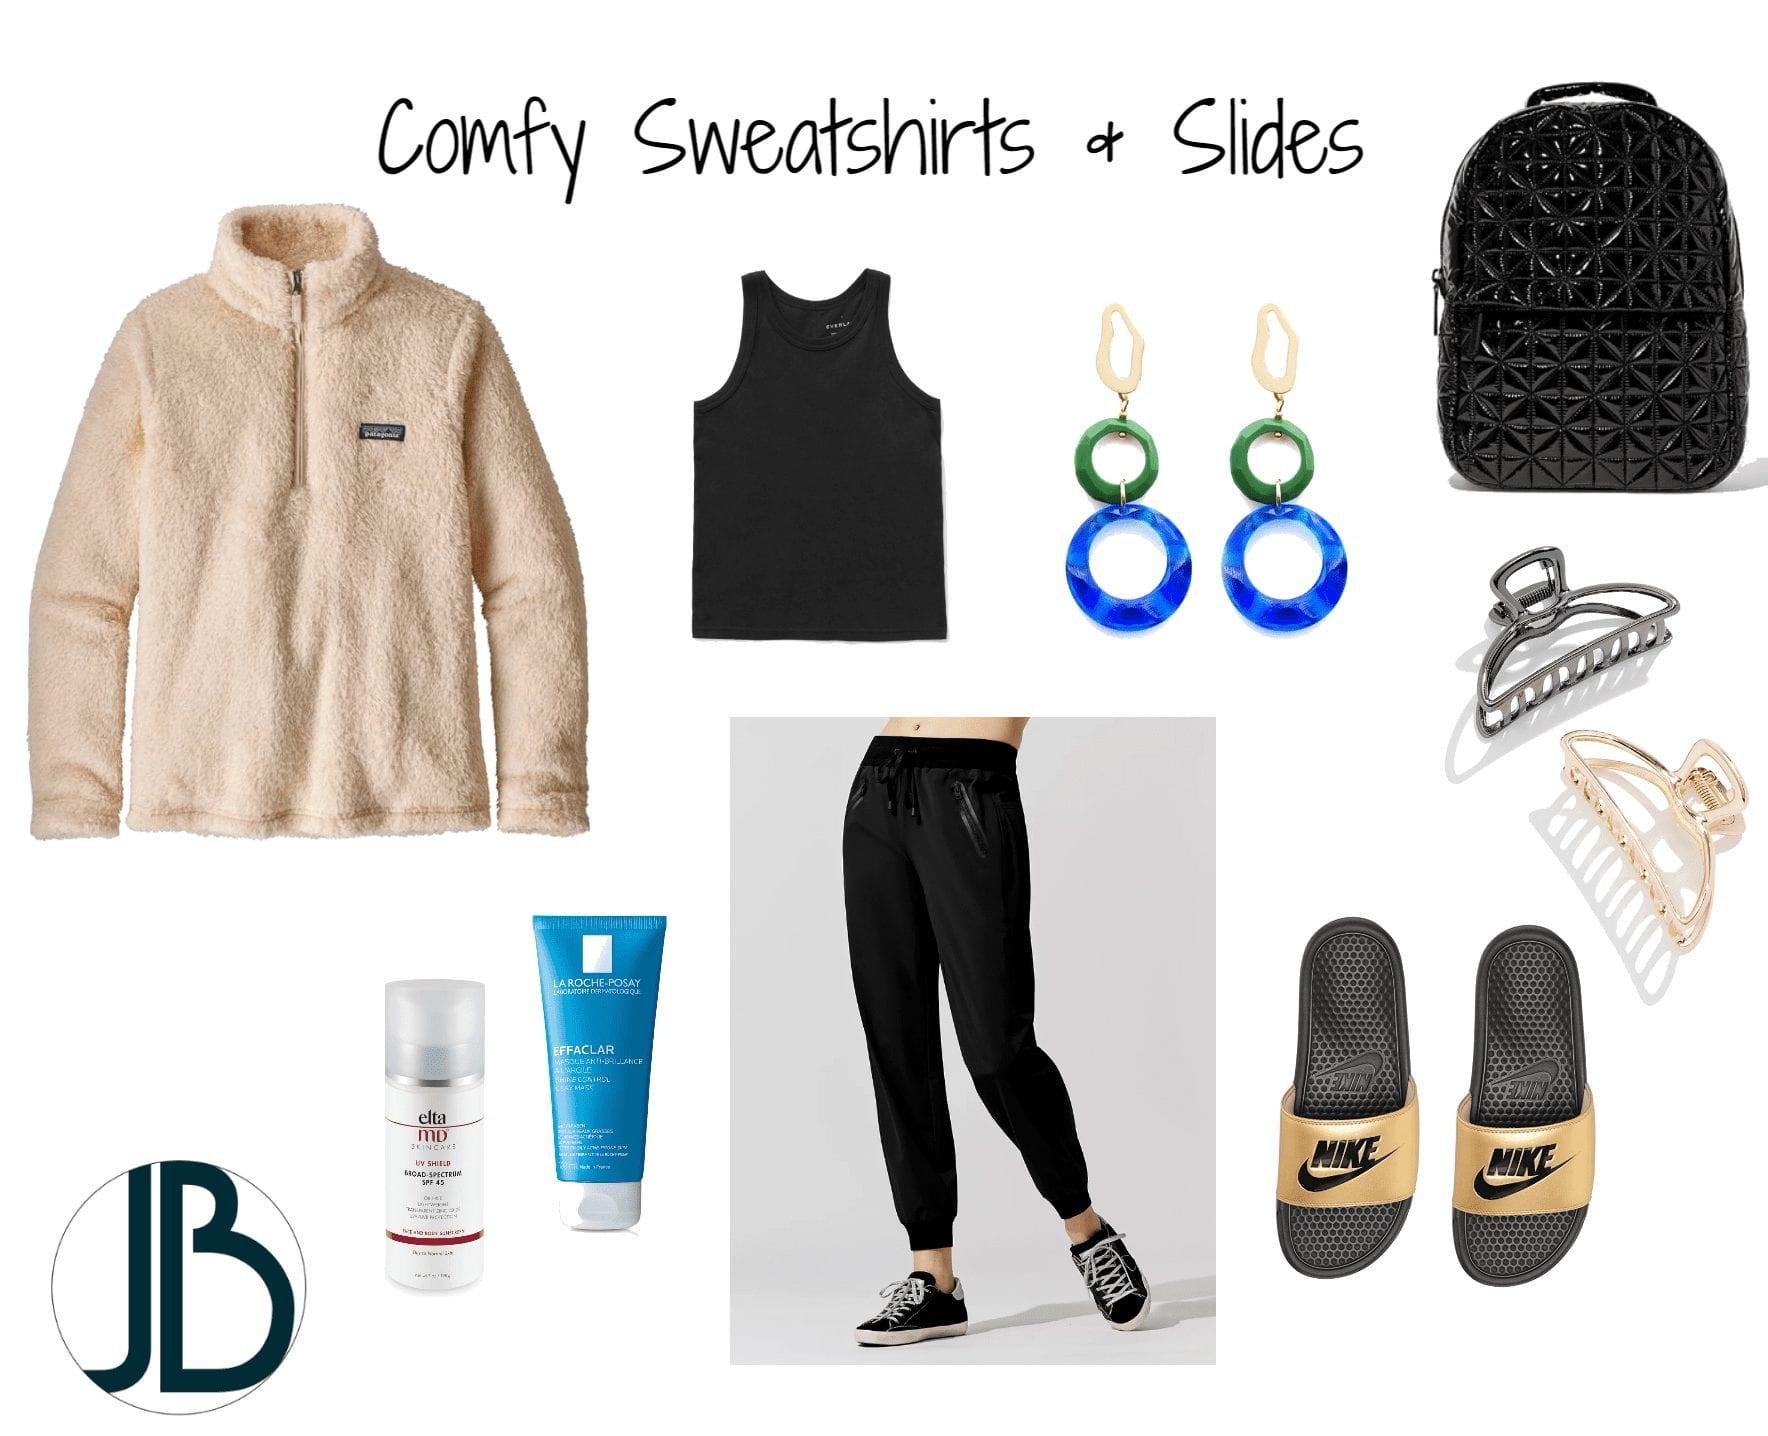 Jami Briggs Fasion Consultant - Comfy Sweatshirts & Slides